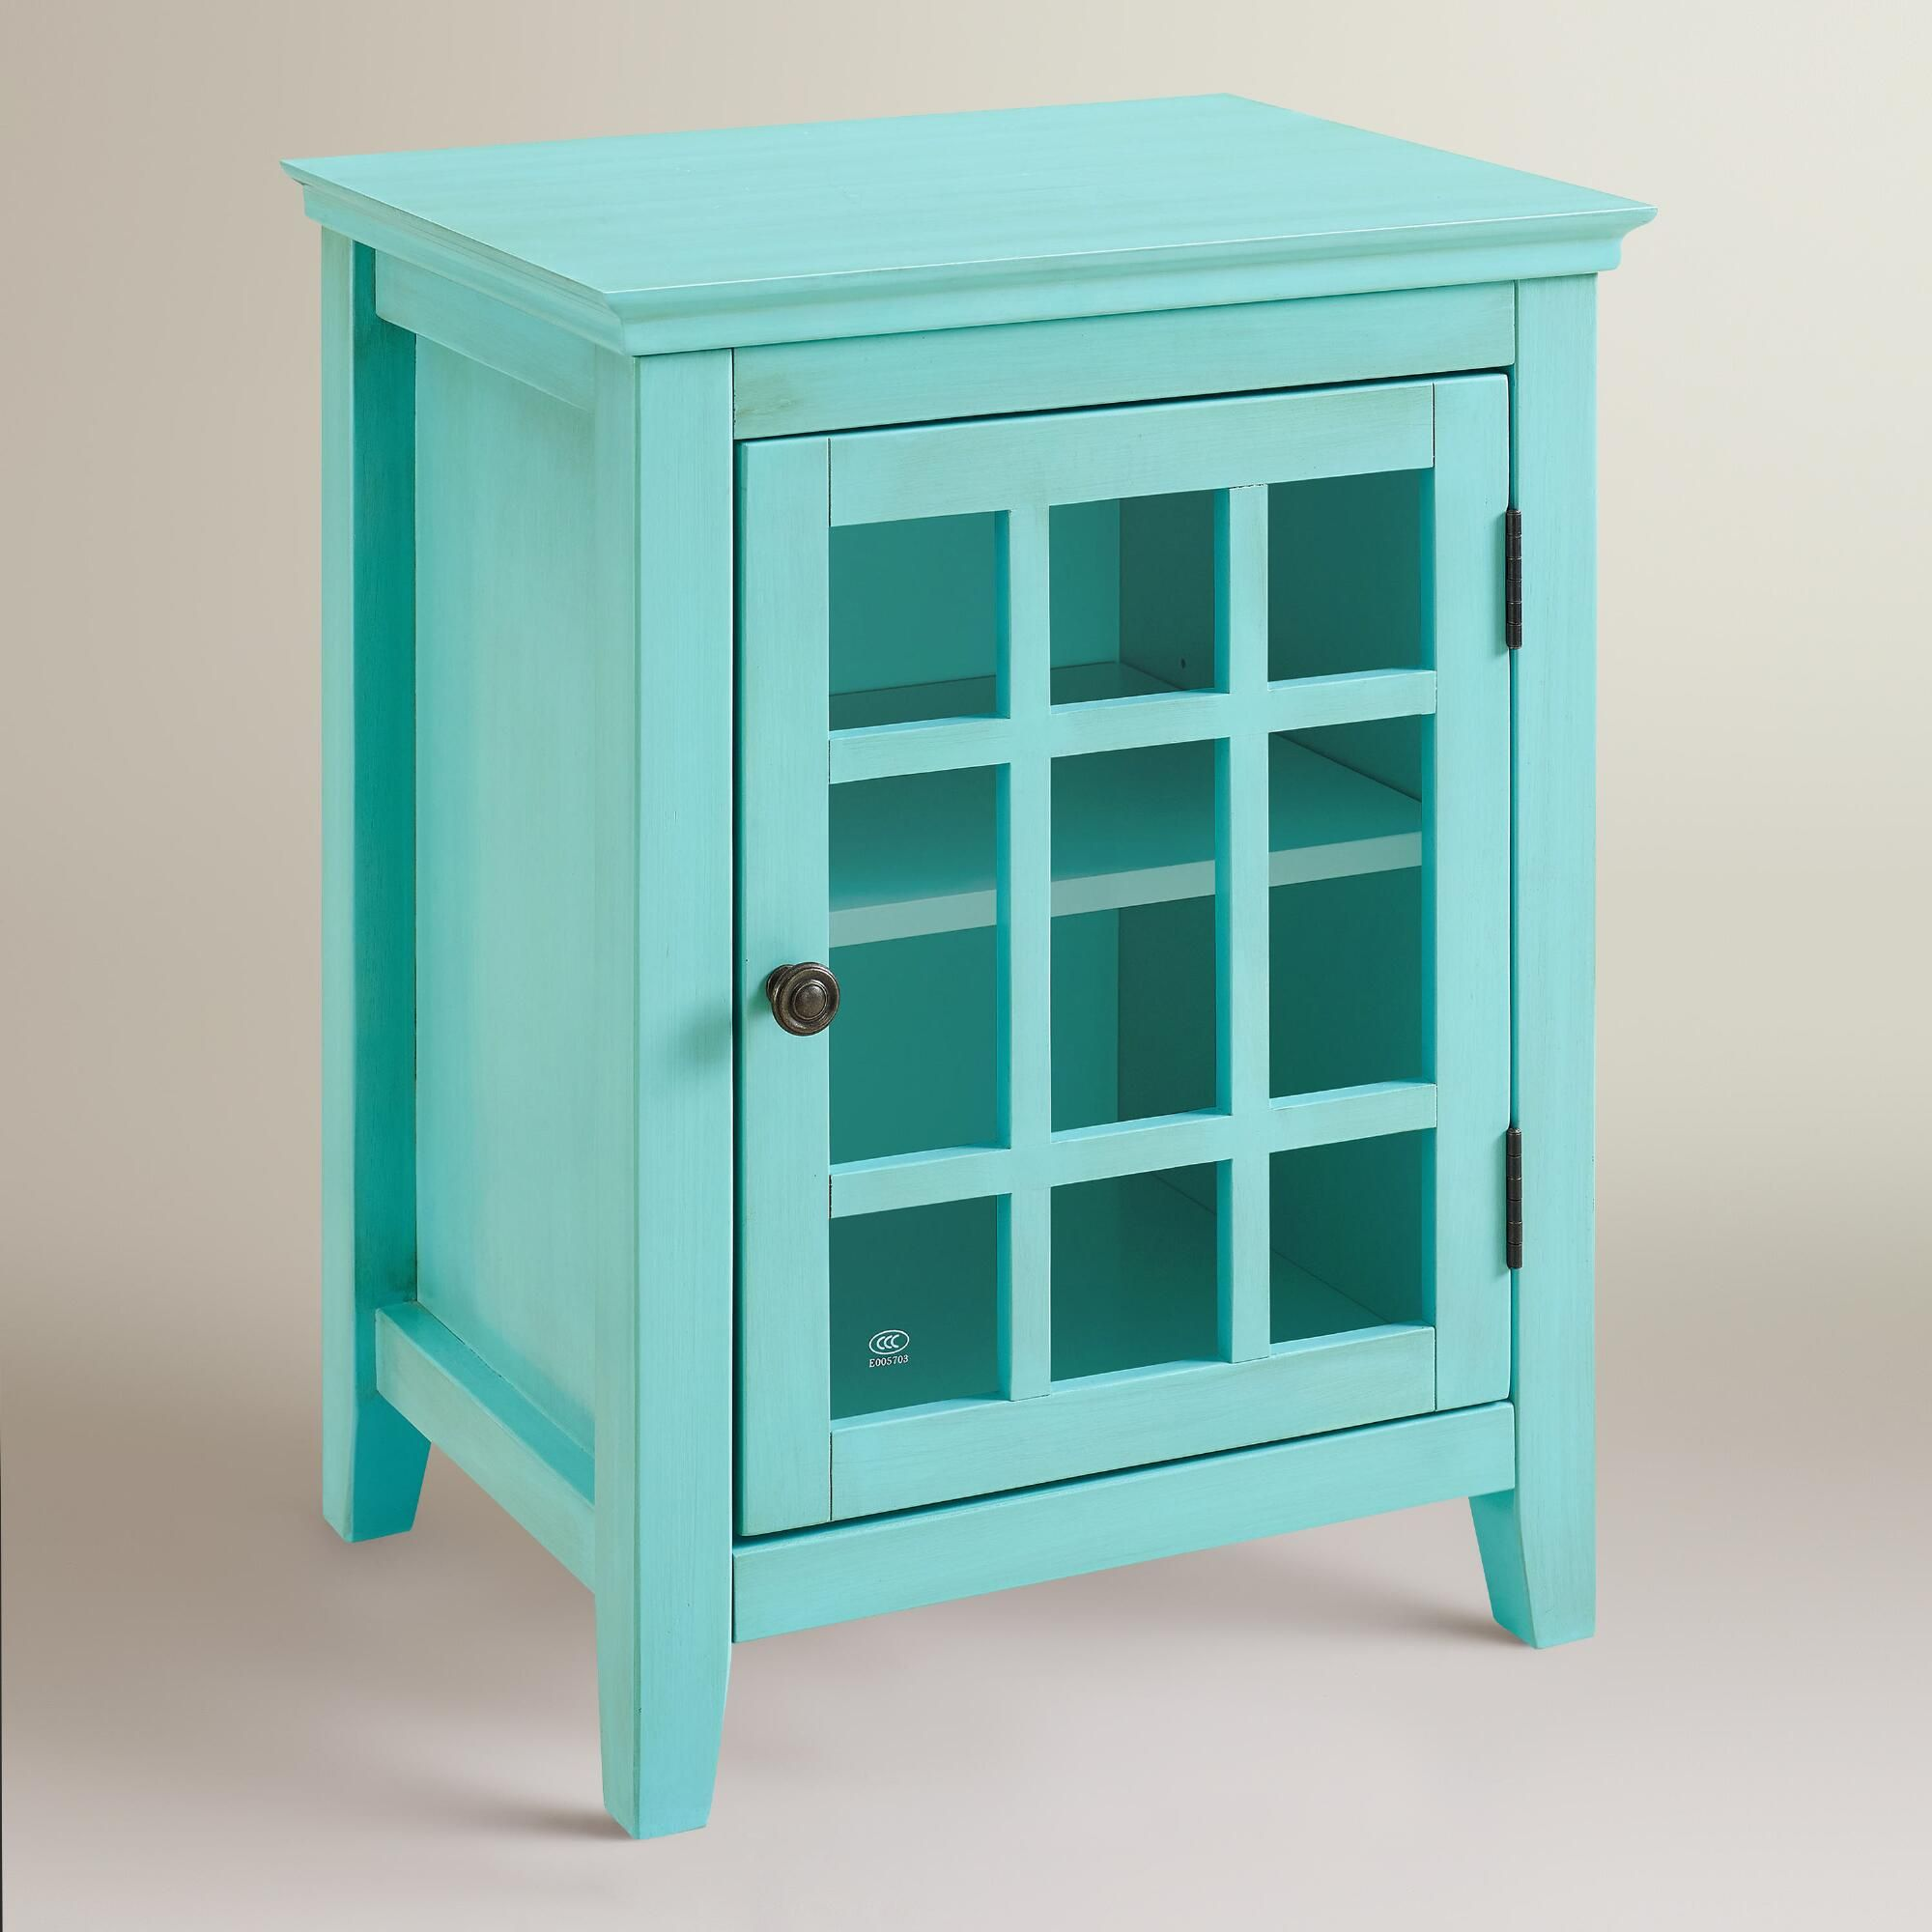 Antique Turquoise Single Door Storage Cabinet